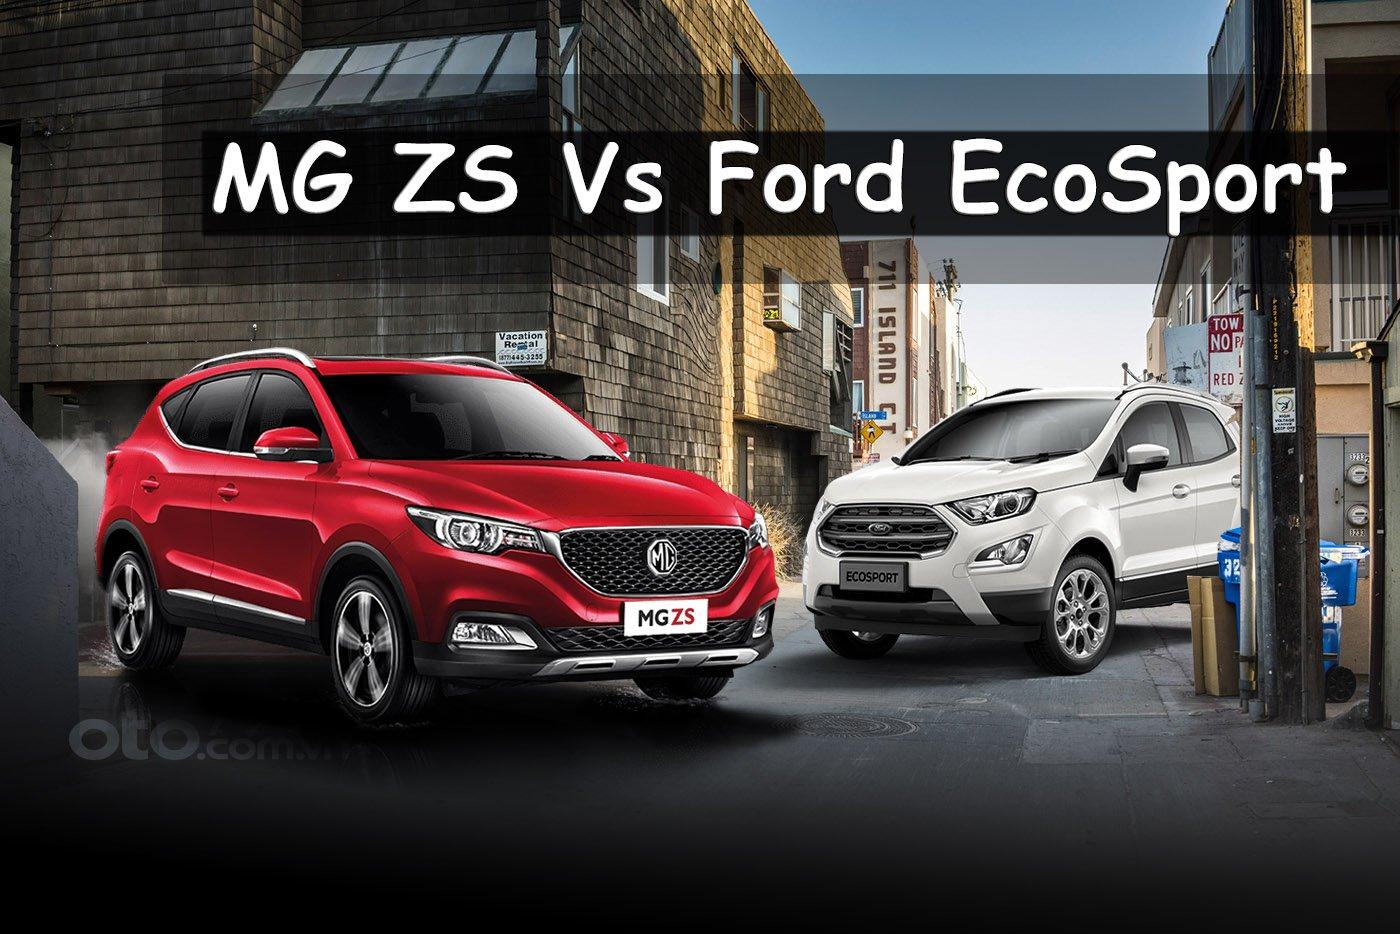 So sanh xe MG ZS 2020 va Ford EcoSport 2020 Tan binh doi dau gia gan